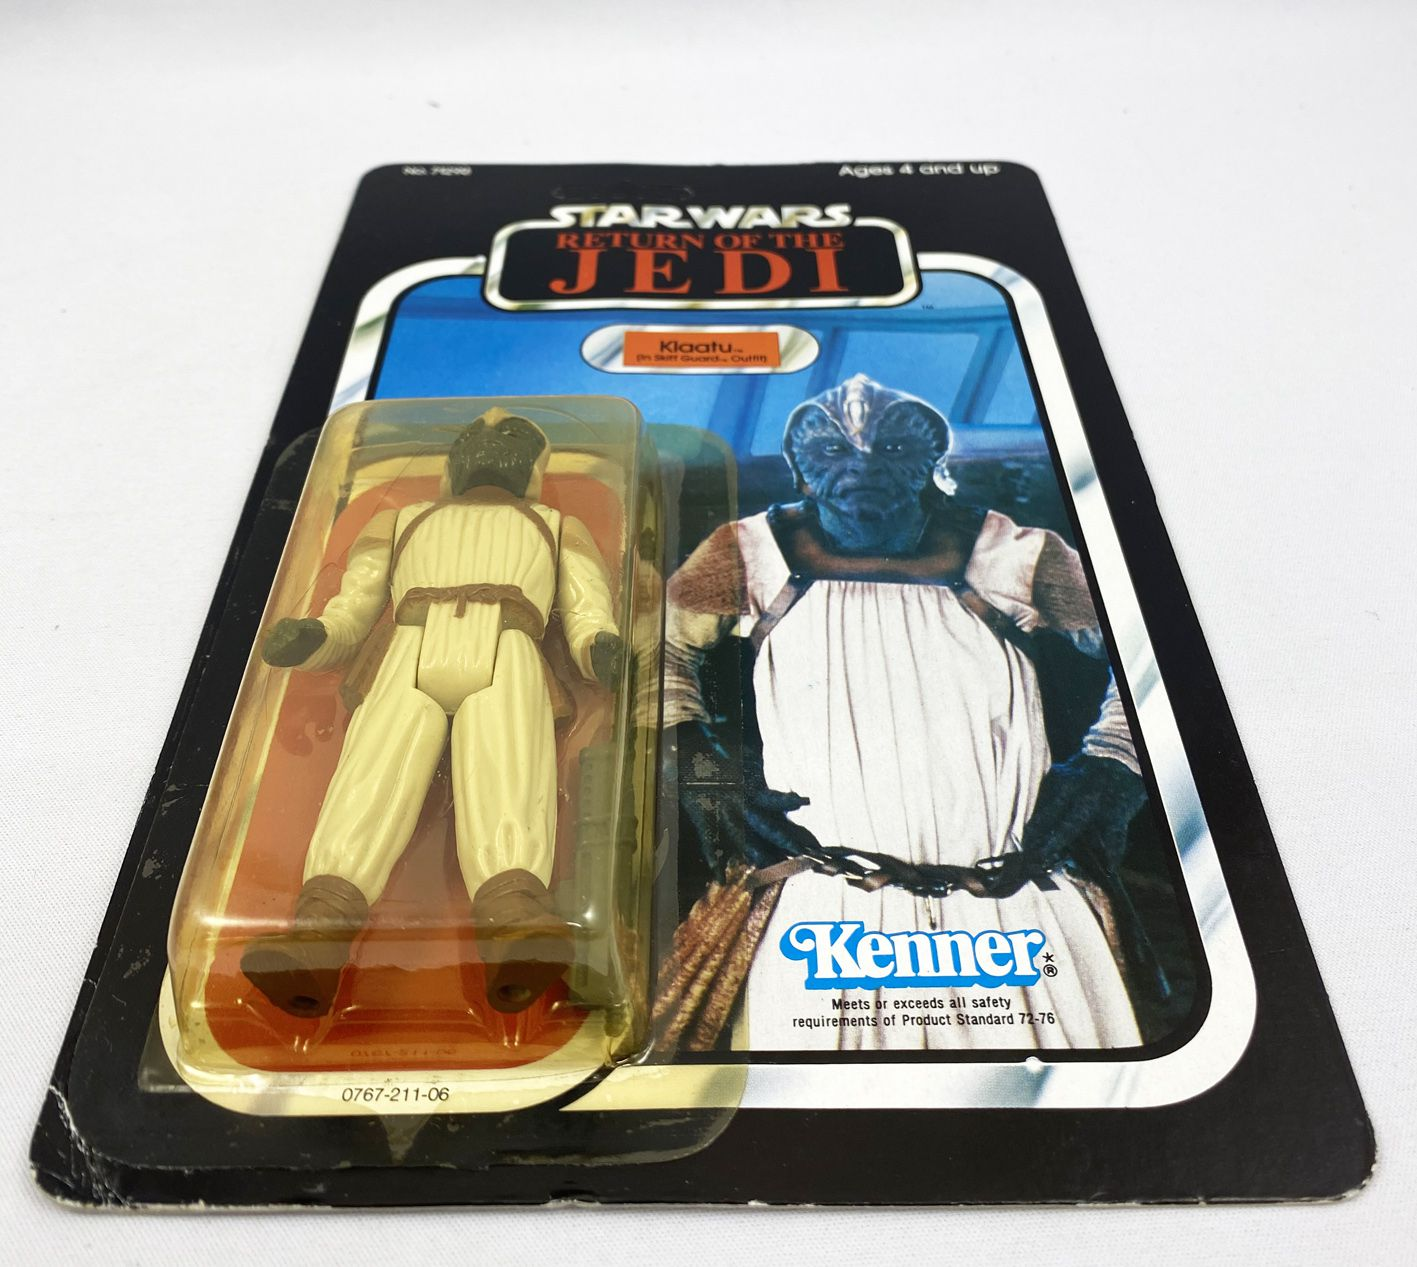 Star Wars ROTJ 1984 - Kenner 79back A - Klaatu (in Skiff Guard Outfit)